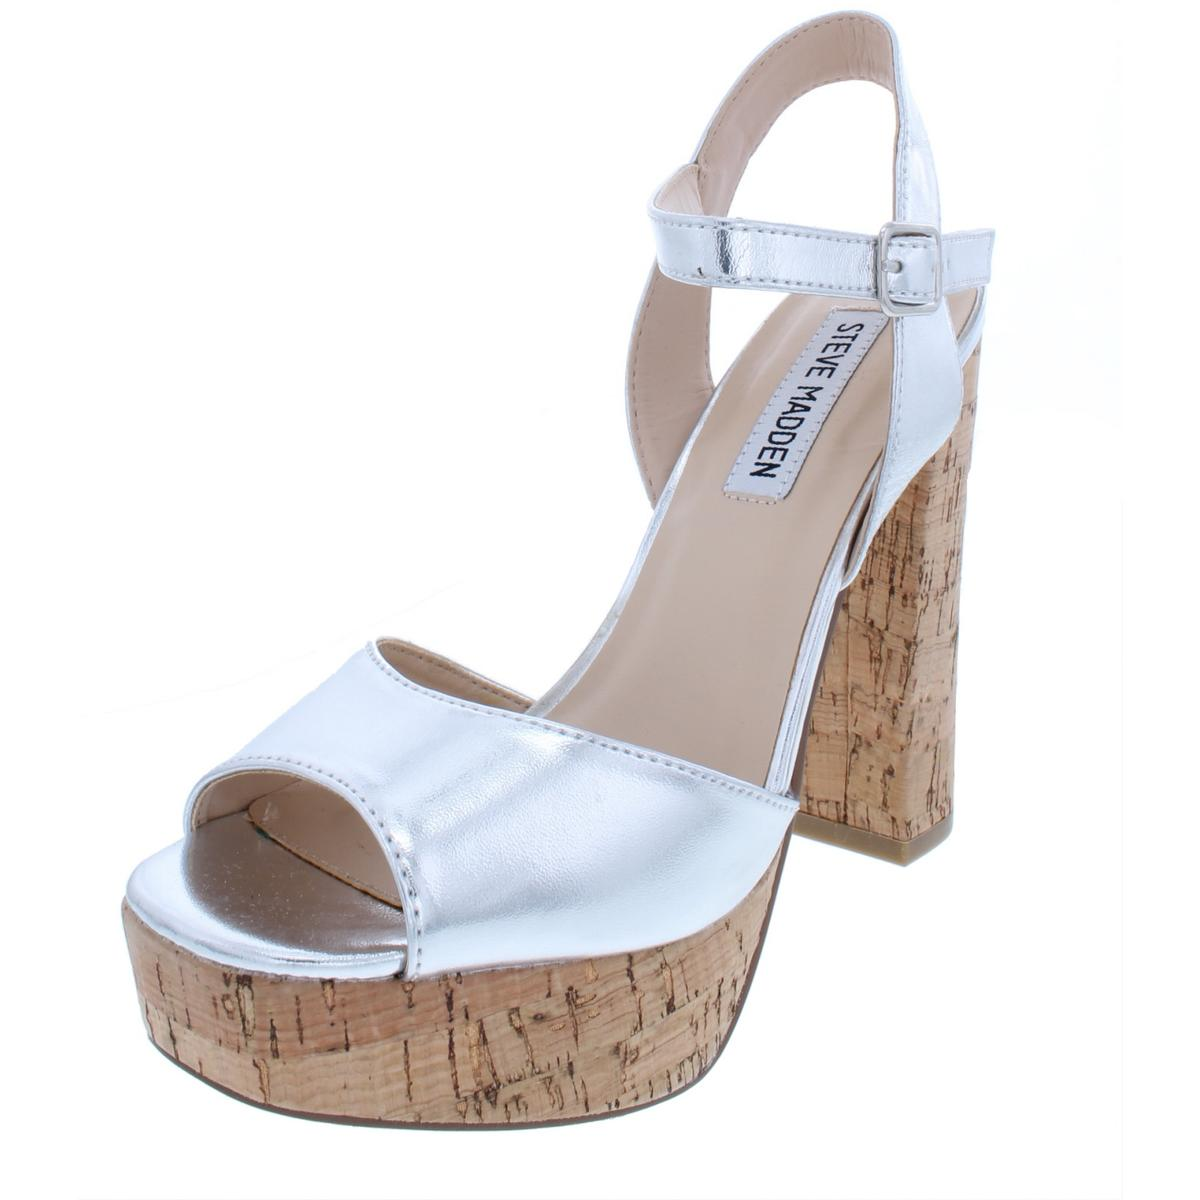 dc66b46131f Details about Steve Madden Womens Notice Silver Platform Sandals 7.5 Medium  (B